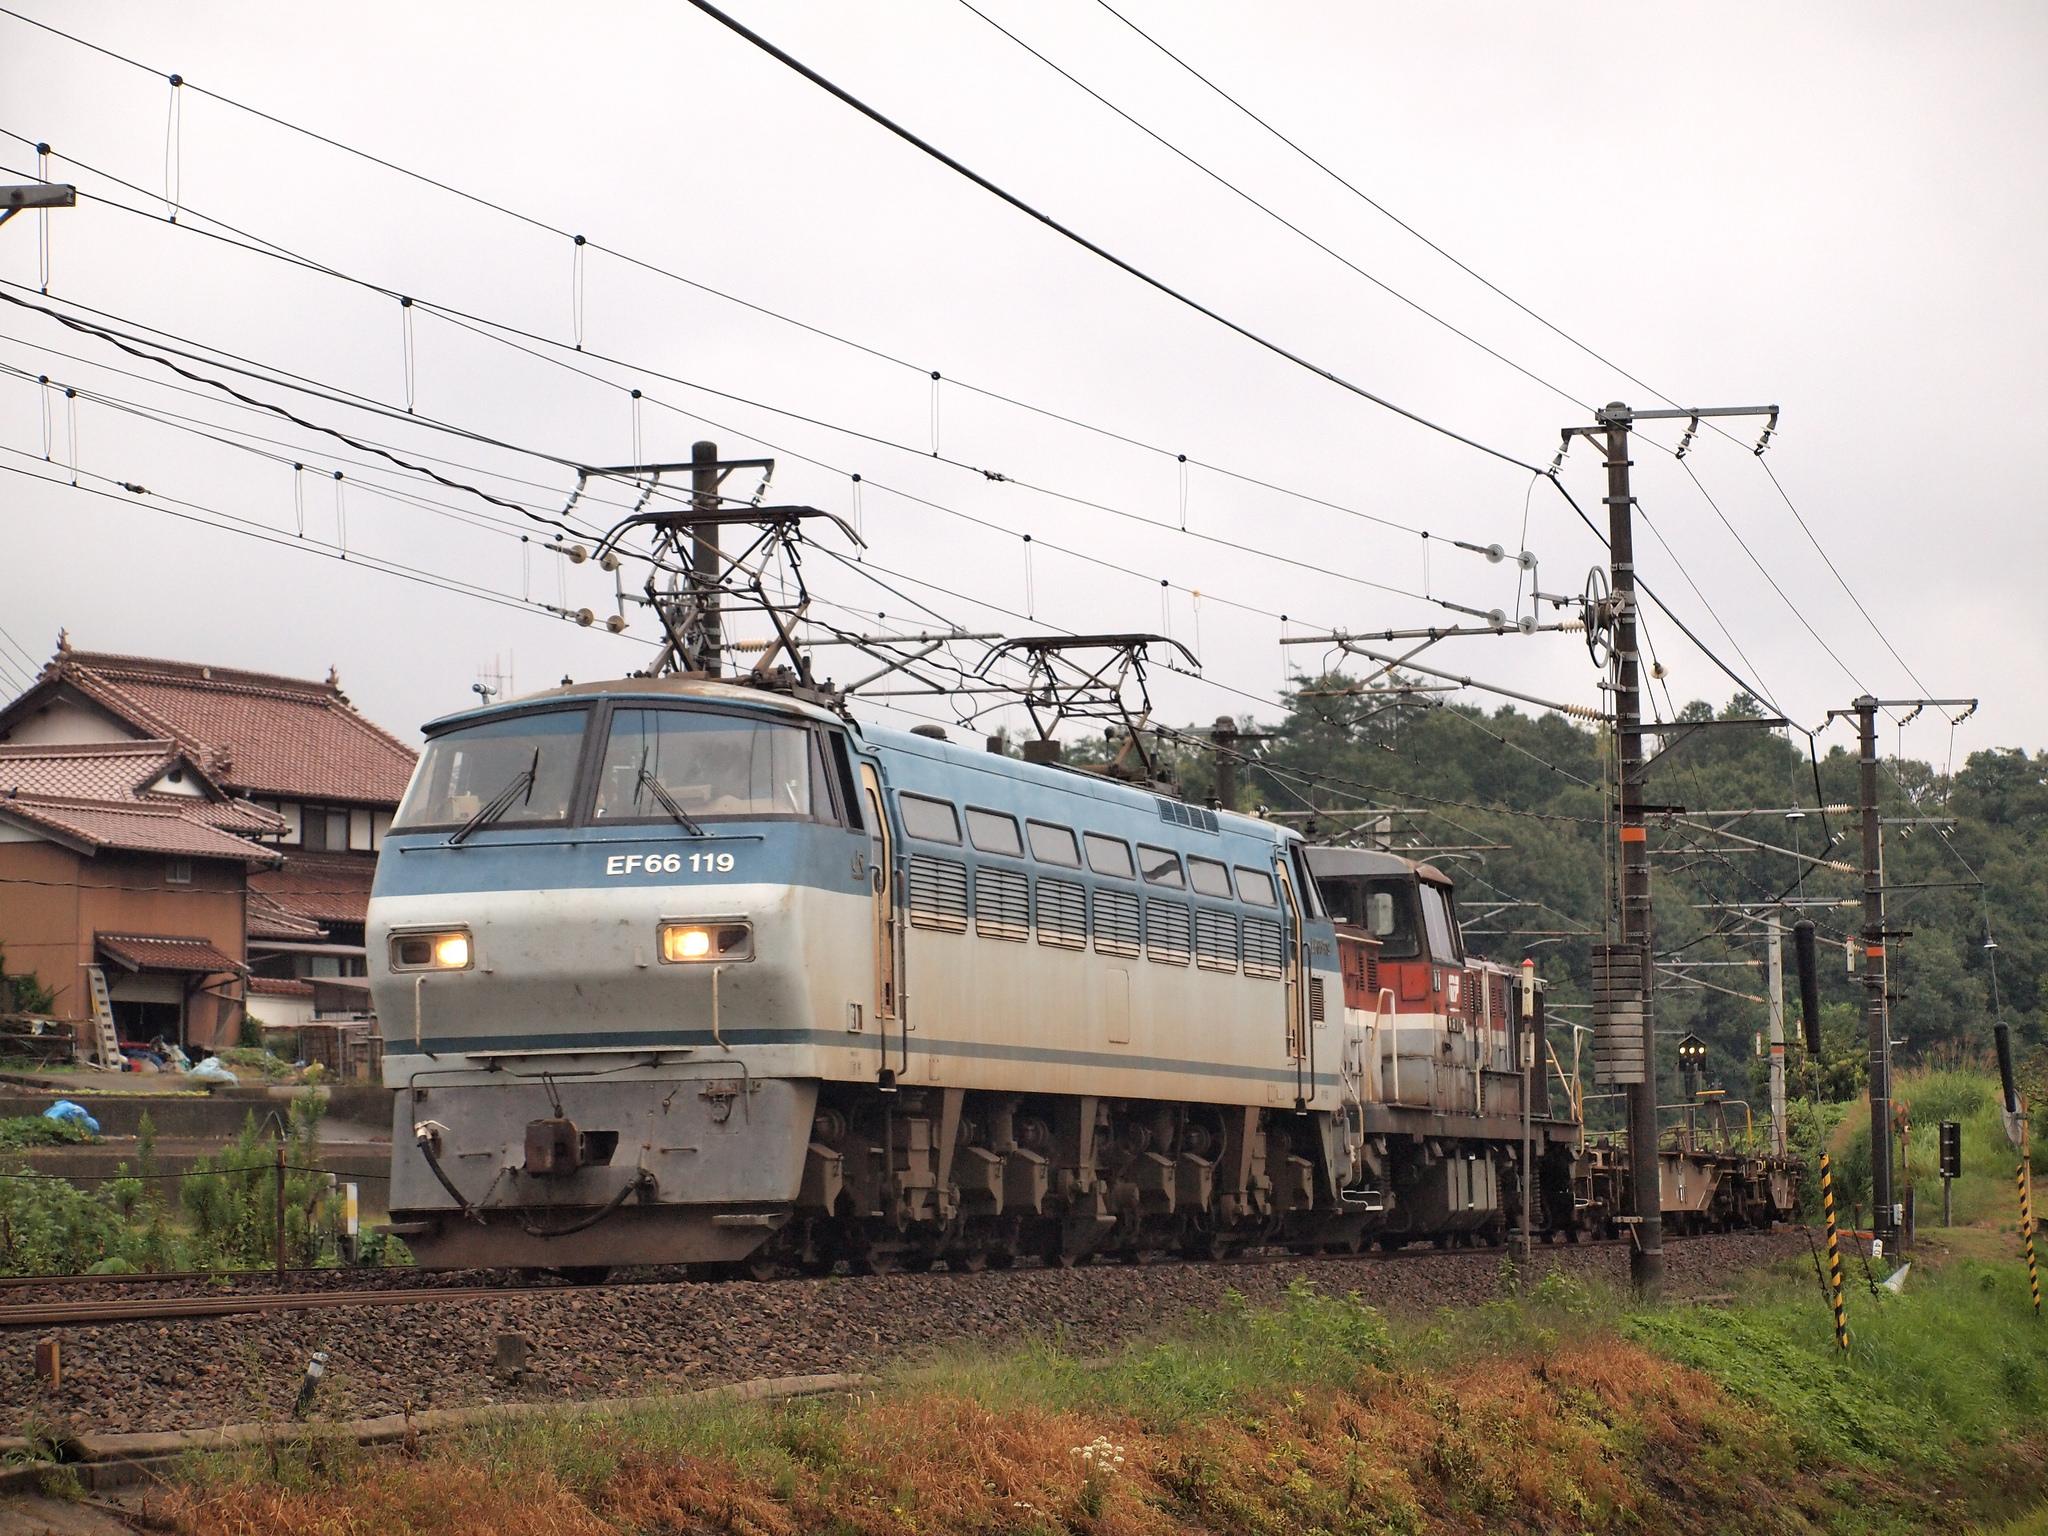 EF66 119